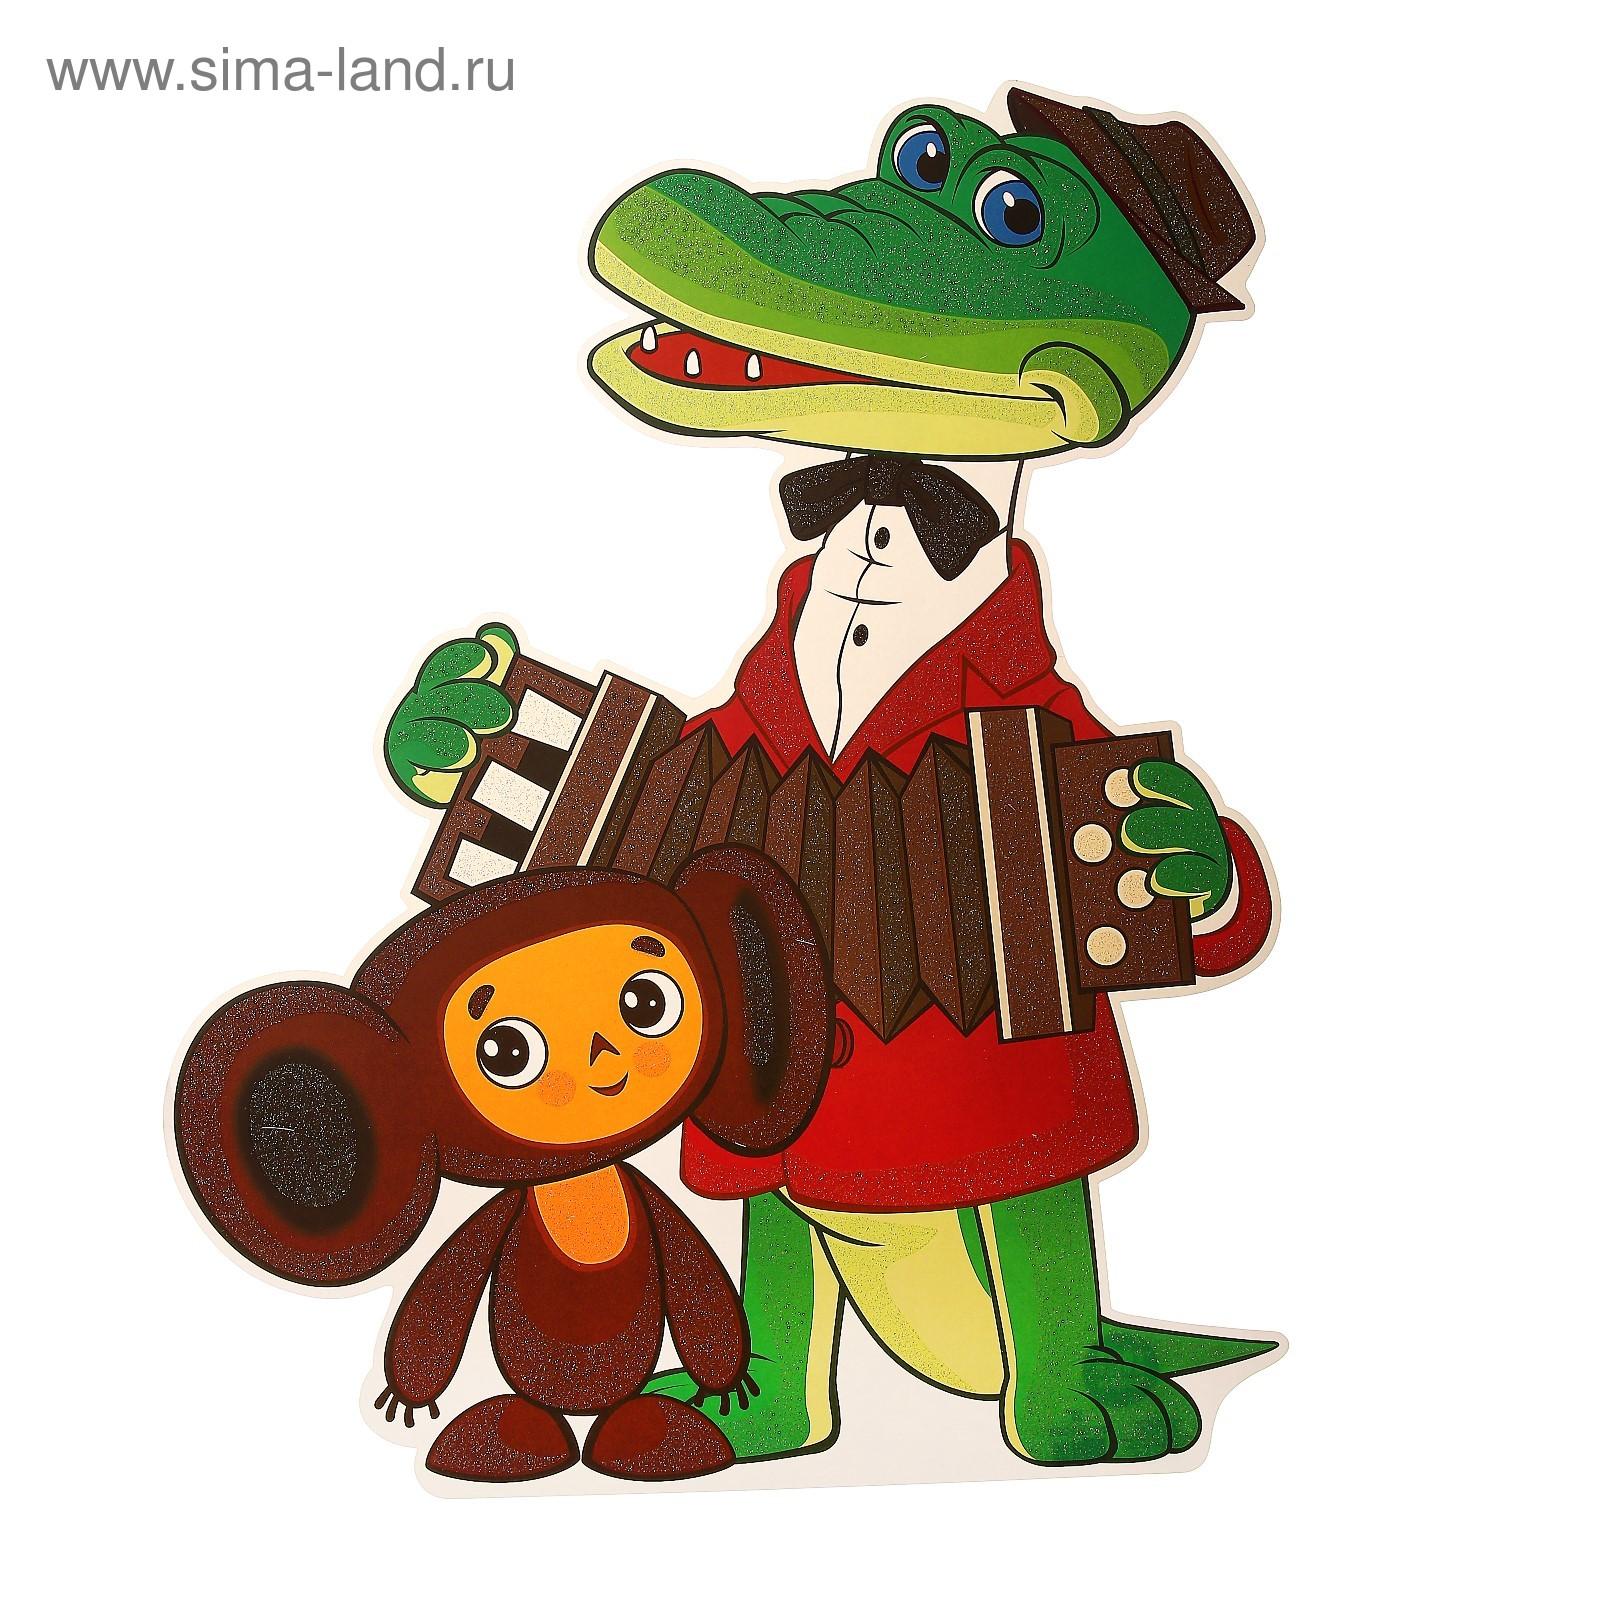 "Плакат фигурный ""Чебурашка и крокодил Гена"" 500 х 350 мм ..."